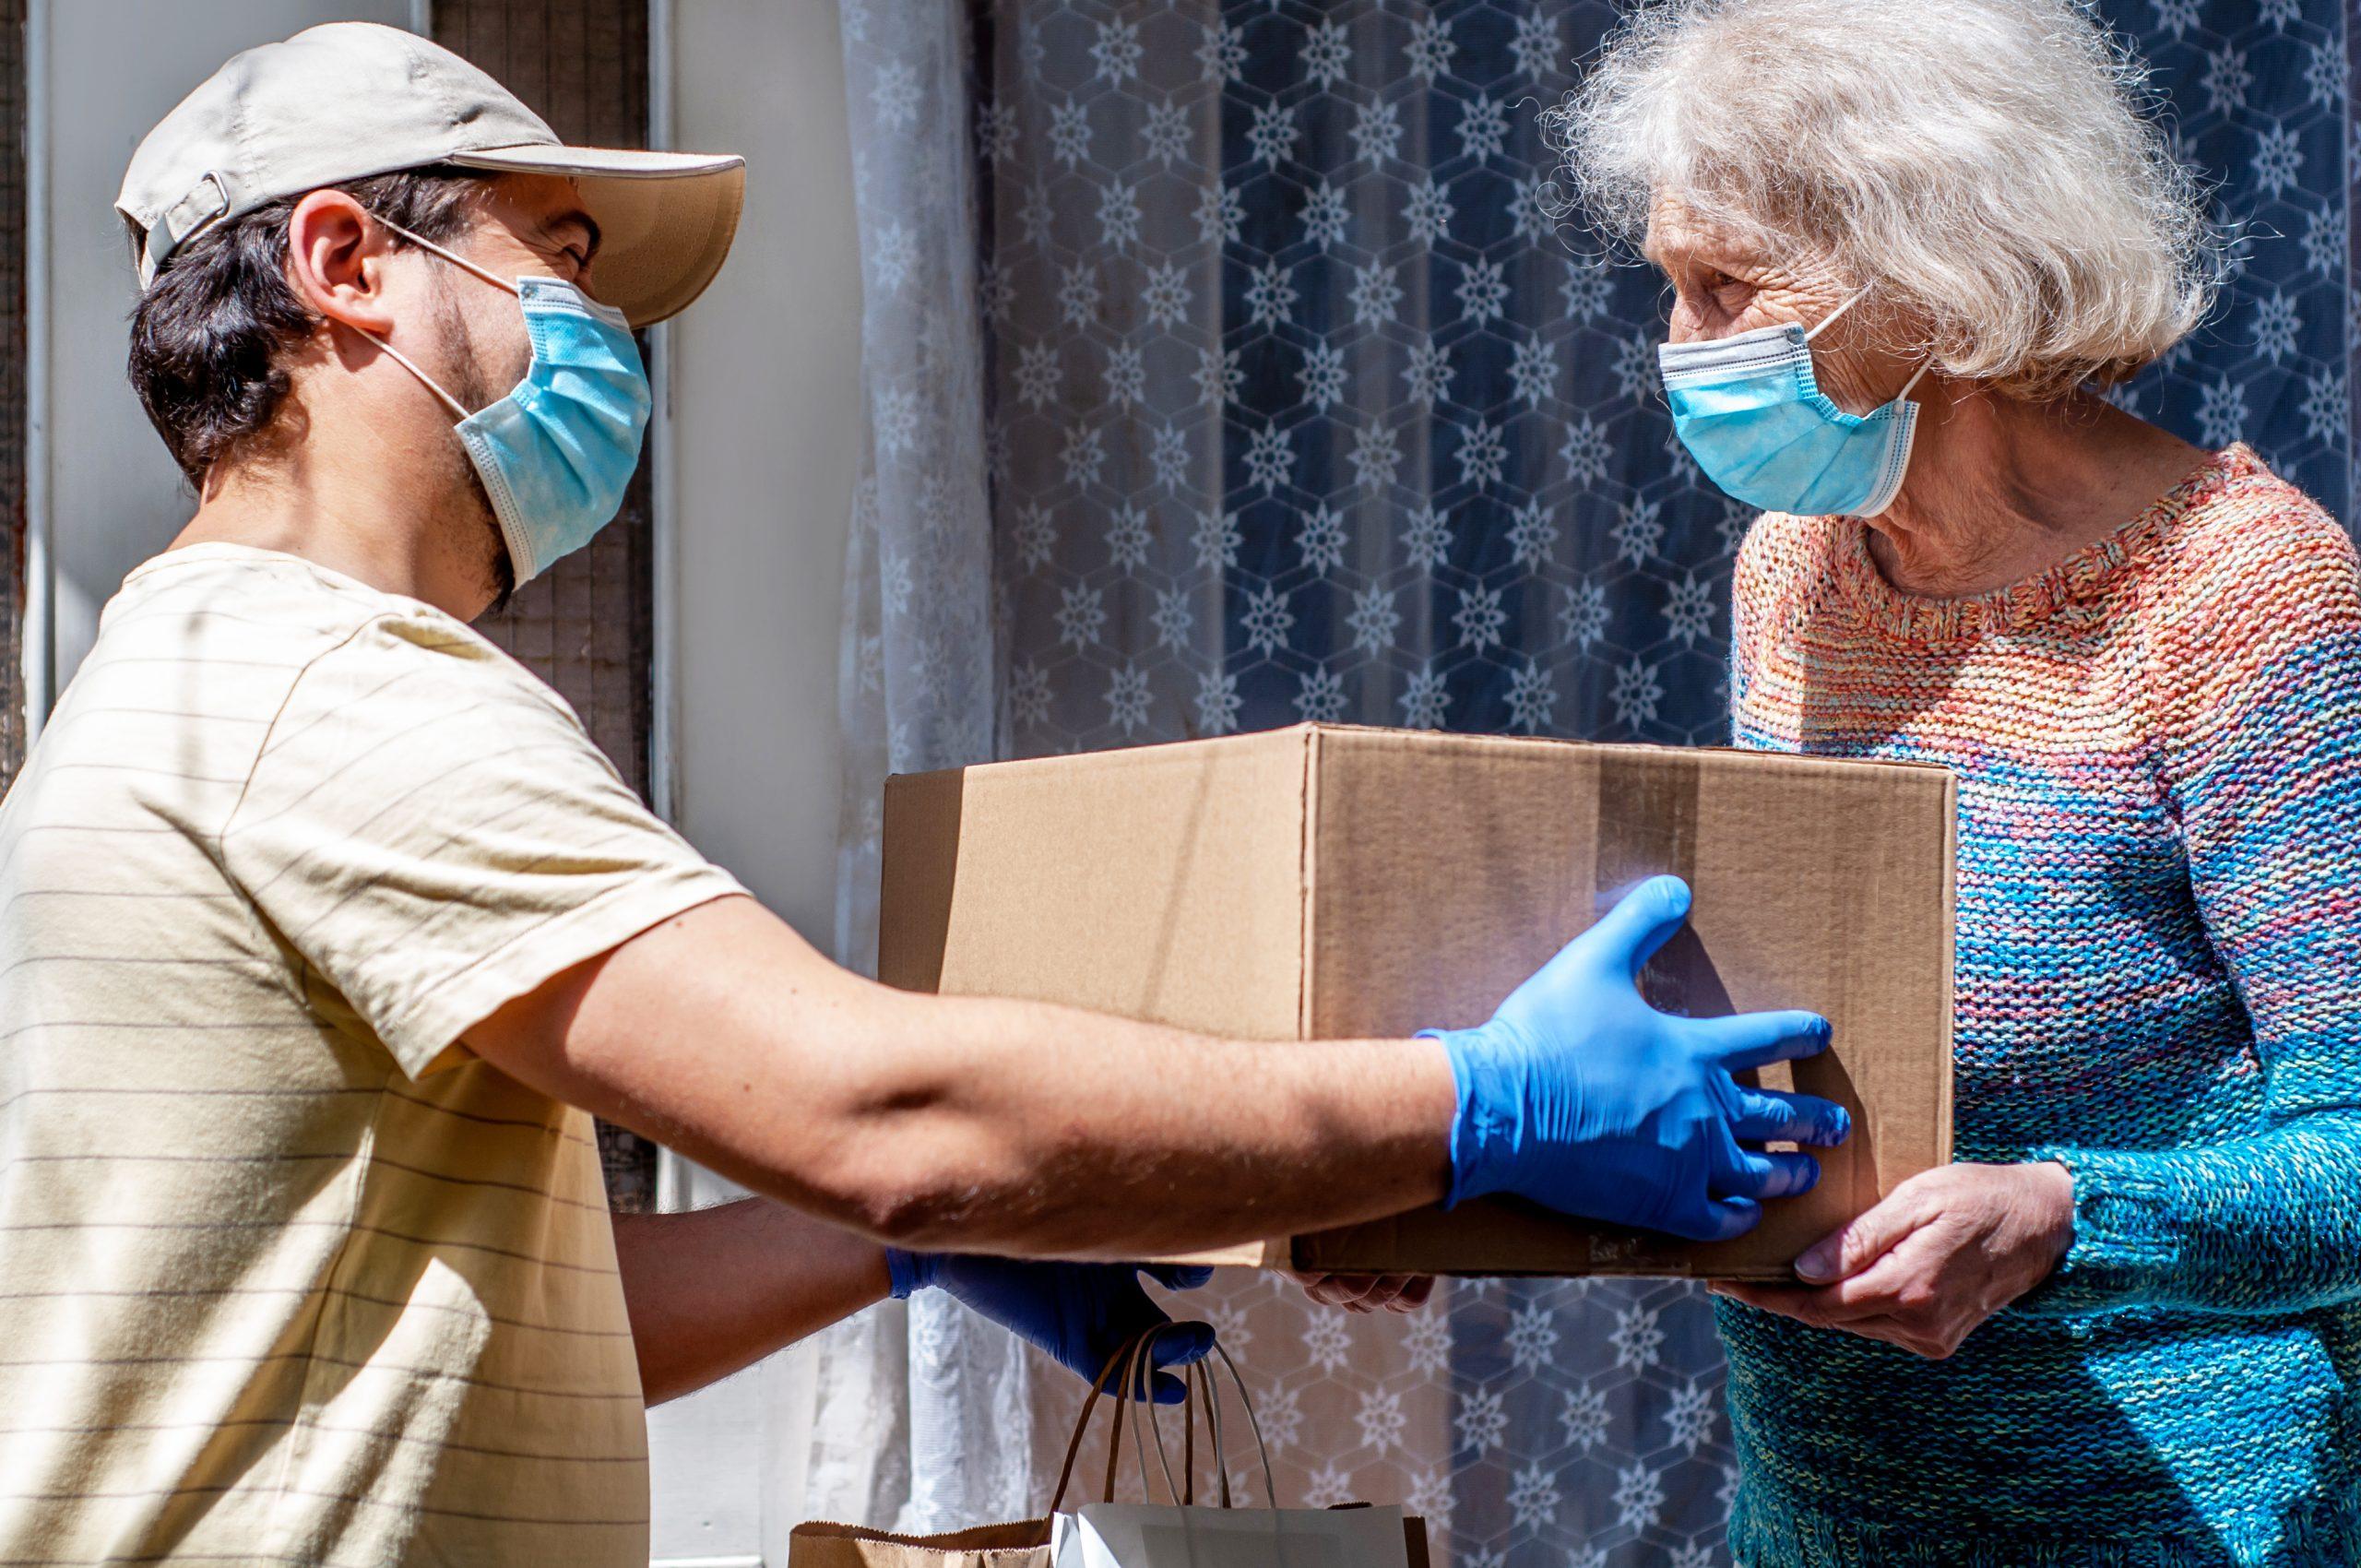 masked volunteer gives food box to elderly masked woman